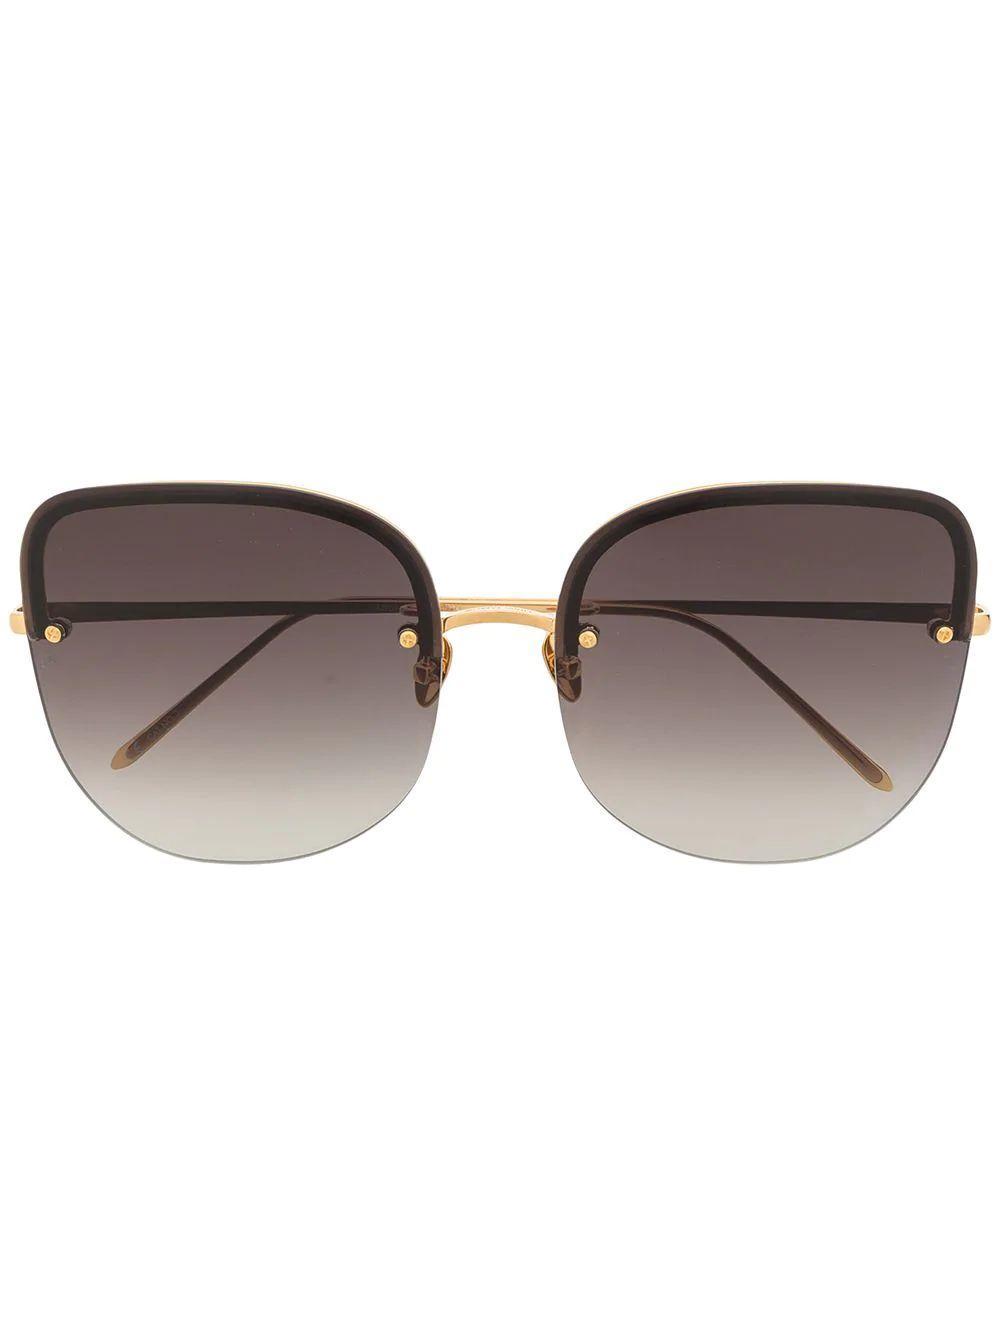 Loni Cat Eye Sunglasses Item # LFL1099C1SUN-C